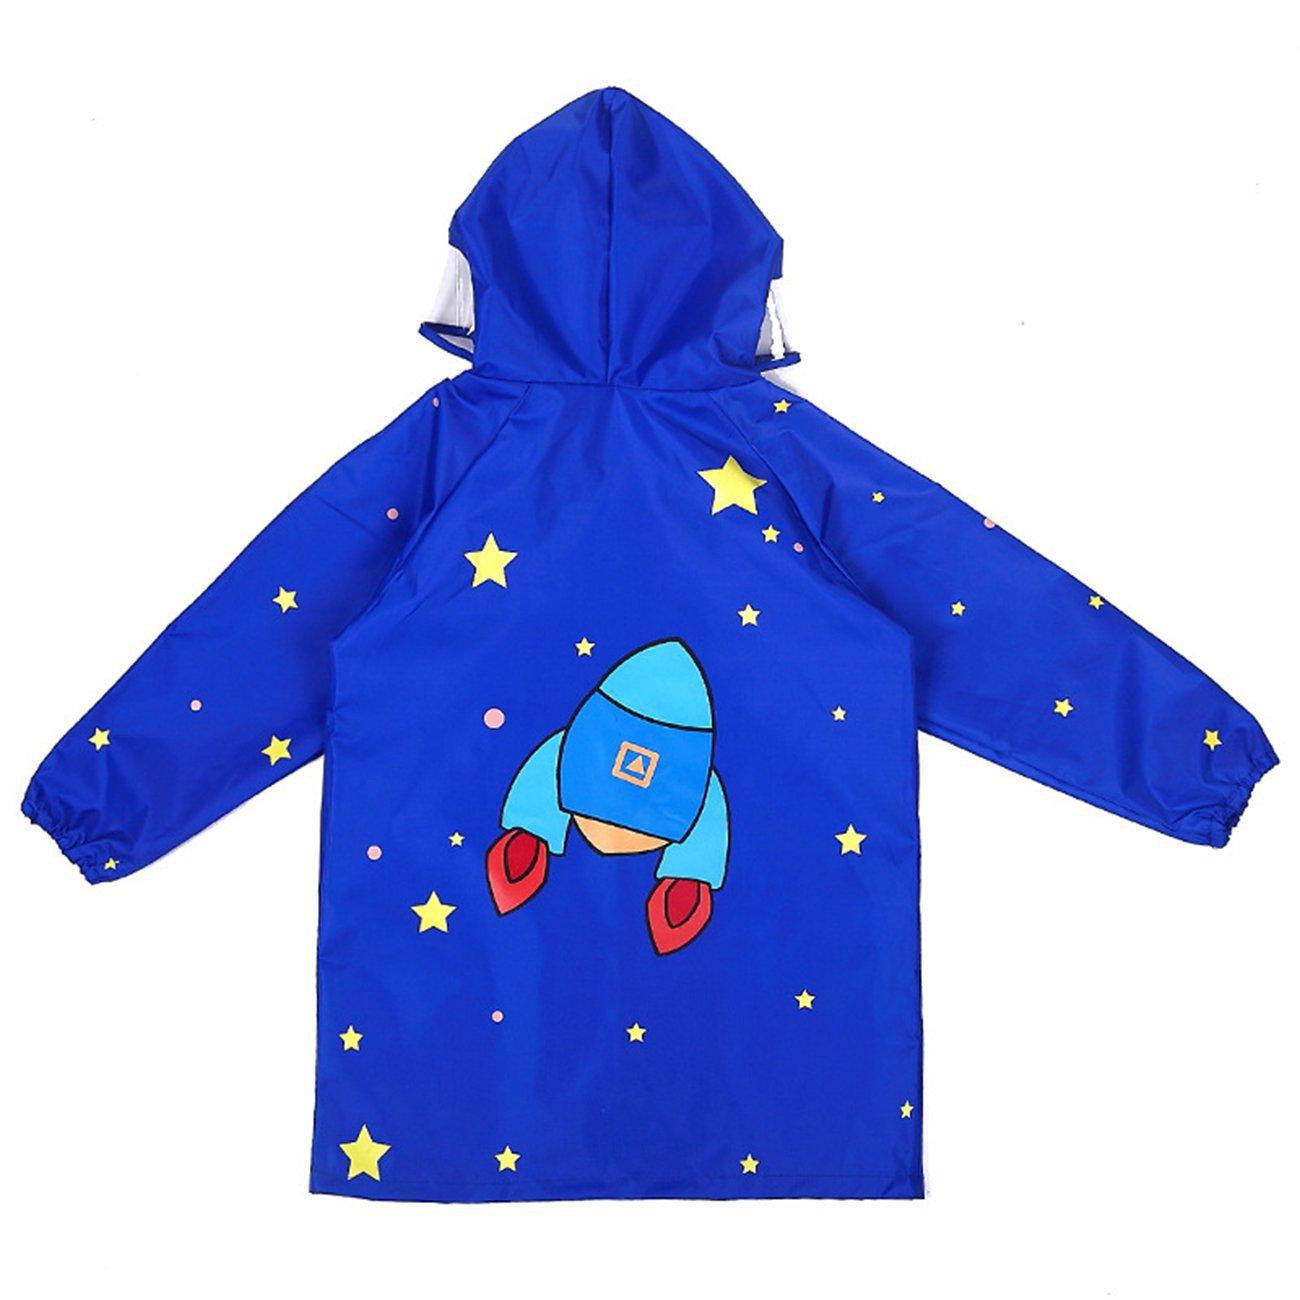 Children Cartoon Waterproof Hooded Rain Jacket Light Children's Poncho Raincoat,Blue,L/Height:120-145cm/fit 7-10T